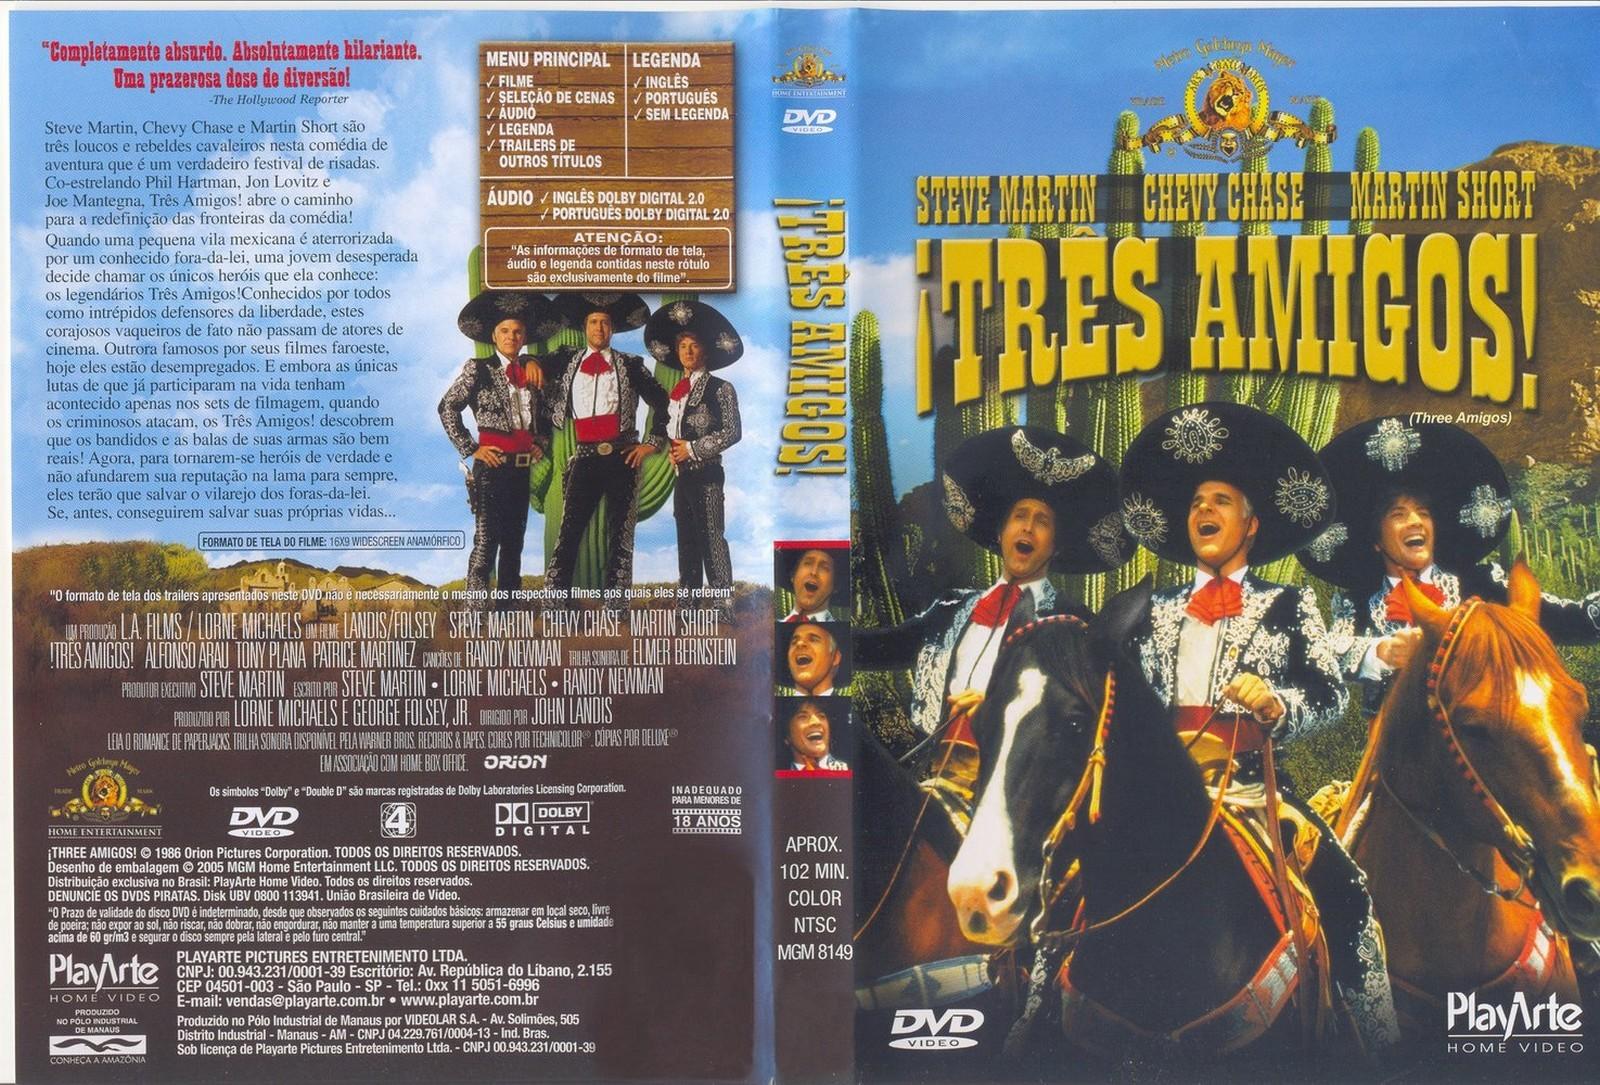 http://3.bp.blogspot.com/_ET4mSvvgIvQ/TLcIwjBP6TI/AAAAAAAAA44/wtnR5TT909o/s1600/Tres-Amigos.jpg